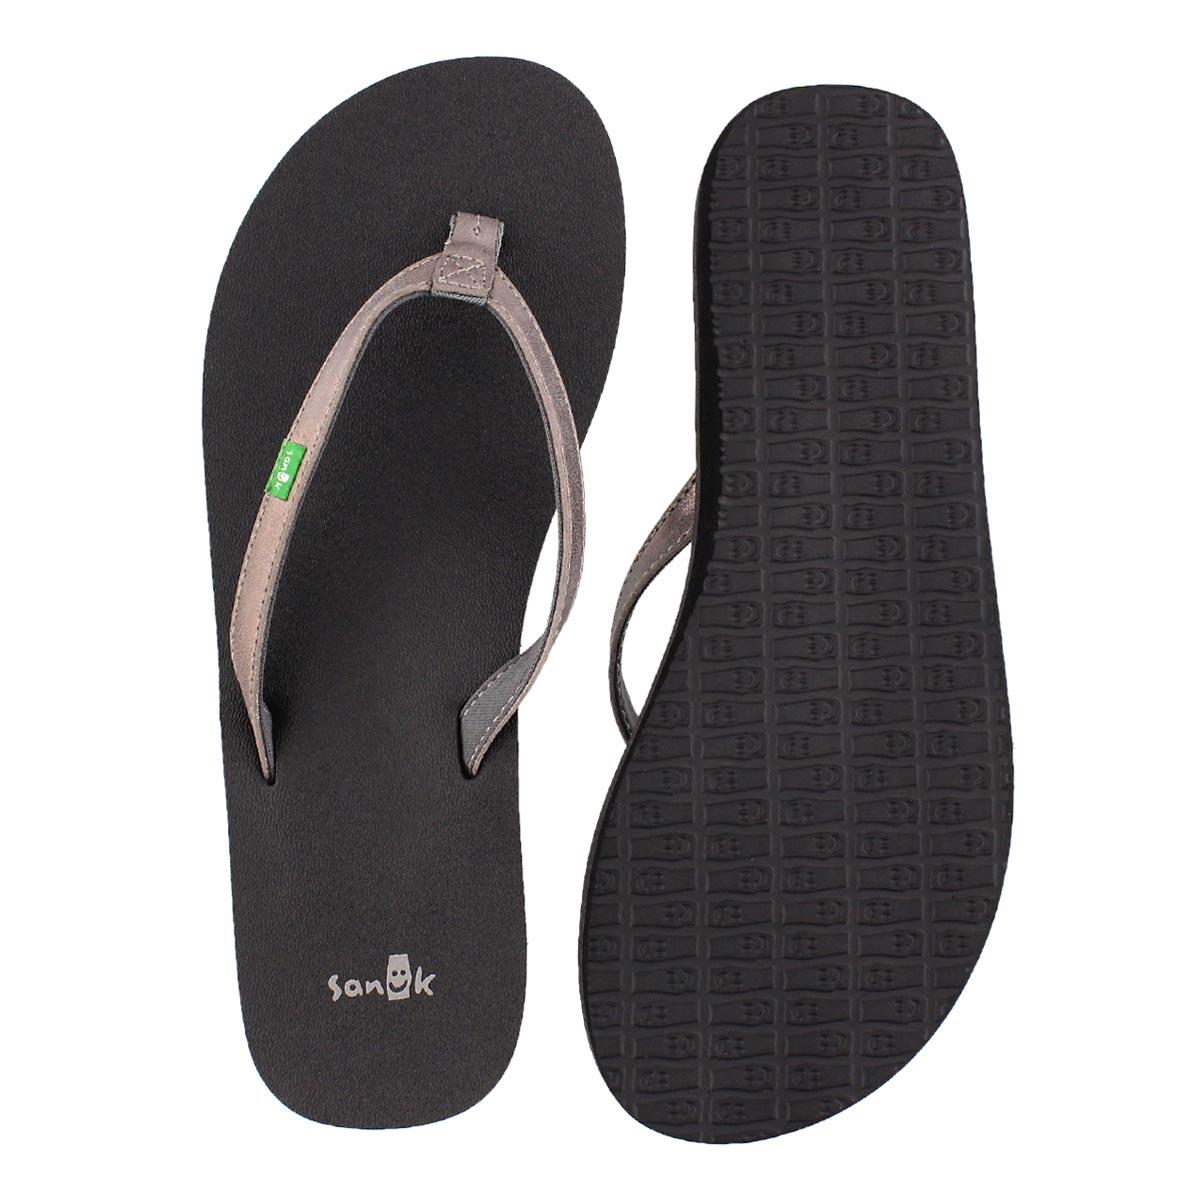 Lds YogaJoy metallic pewter flip flop